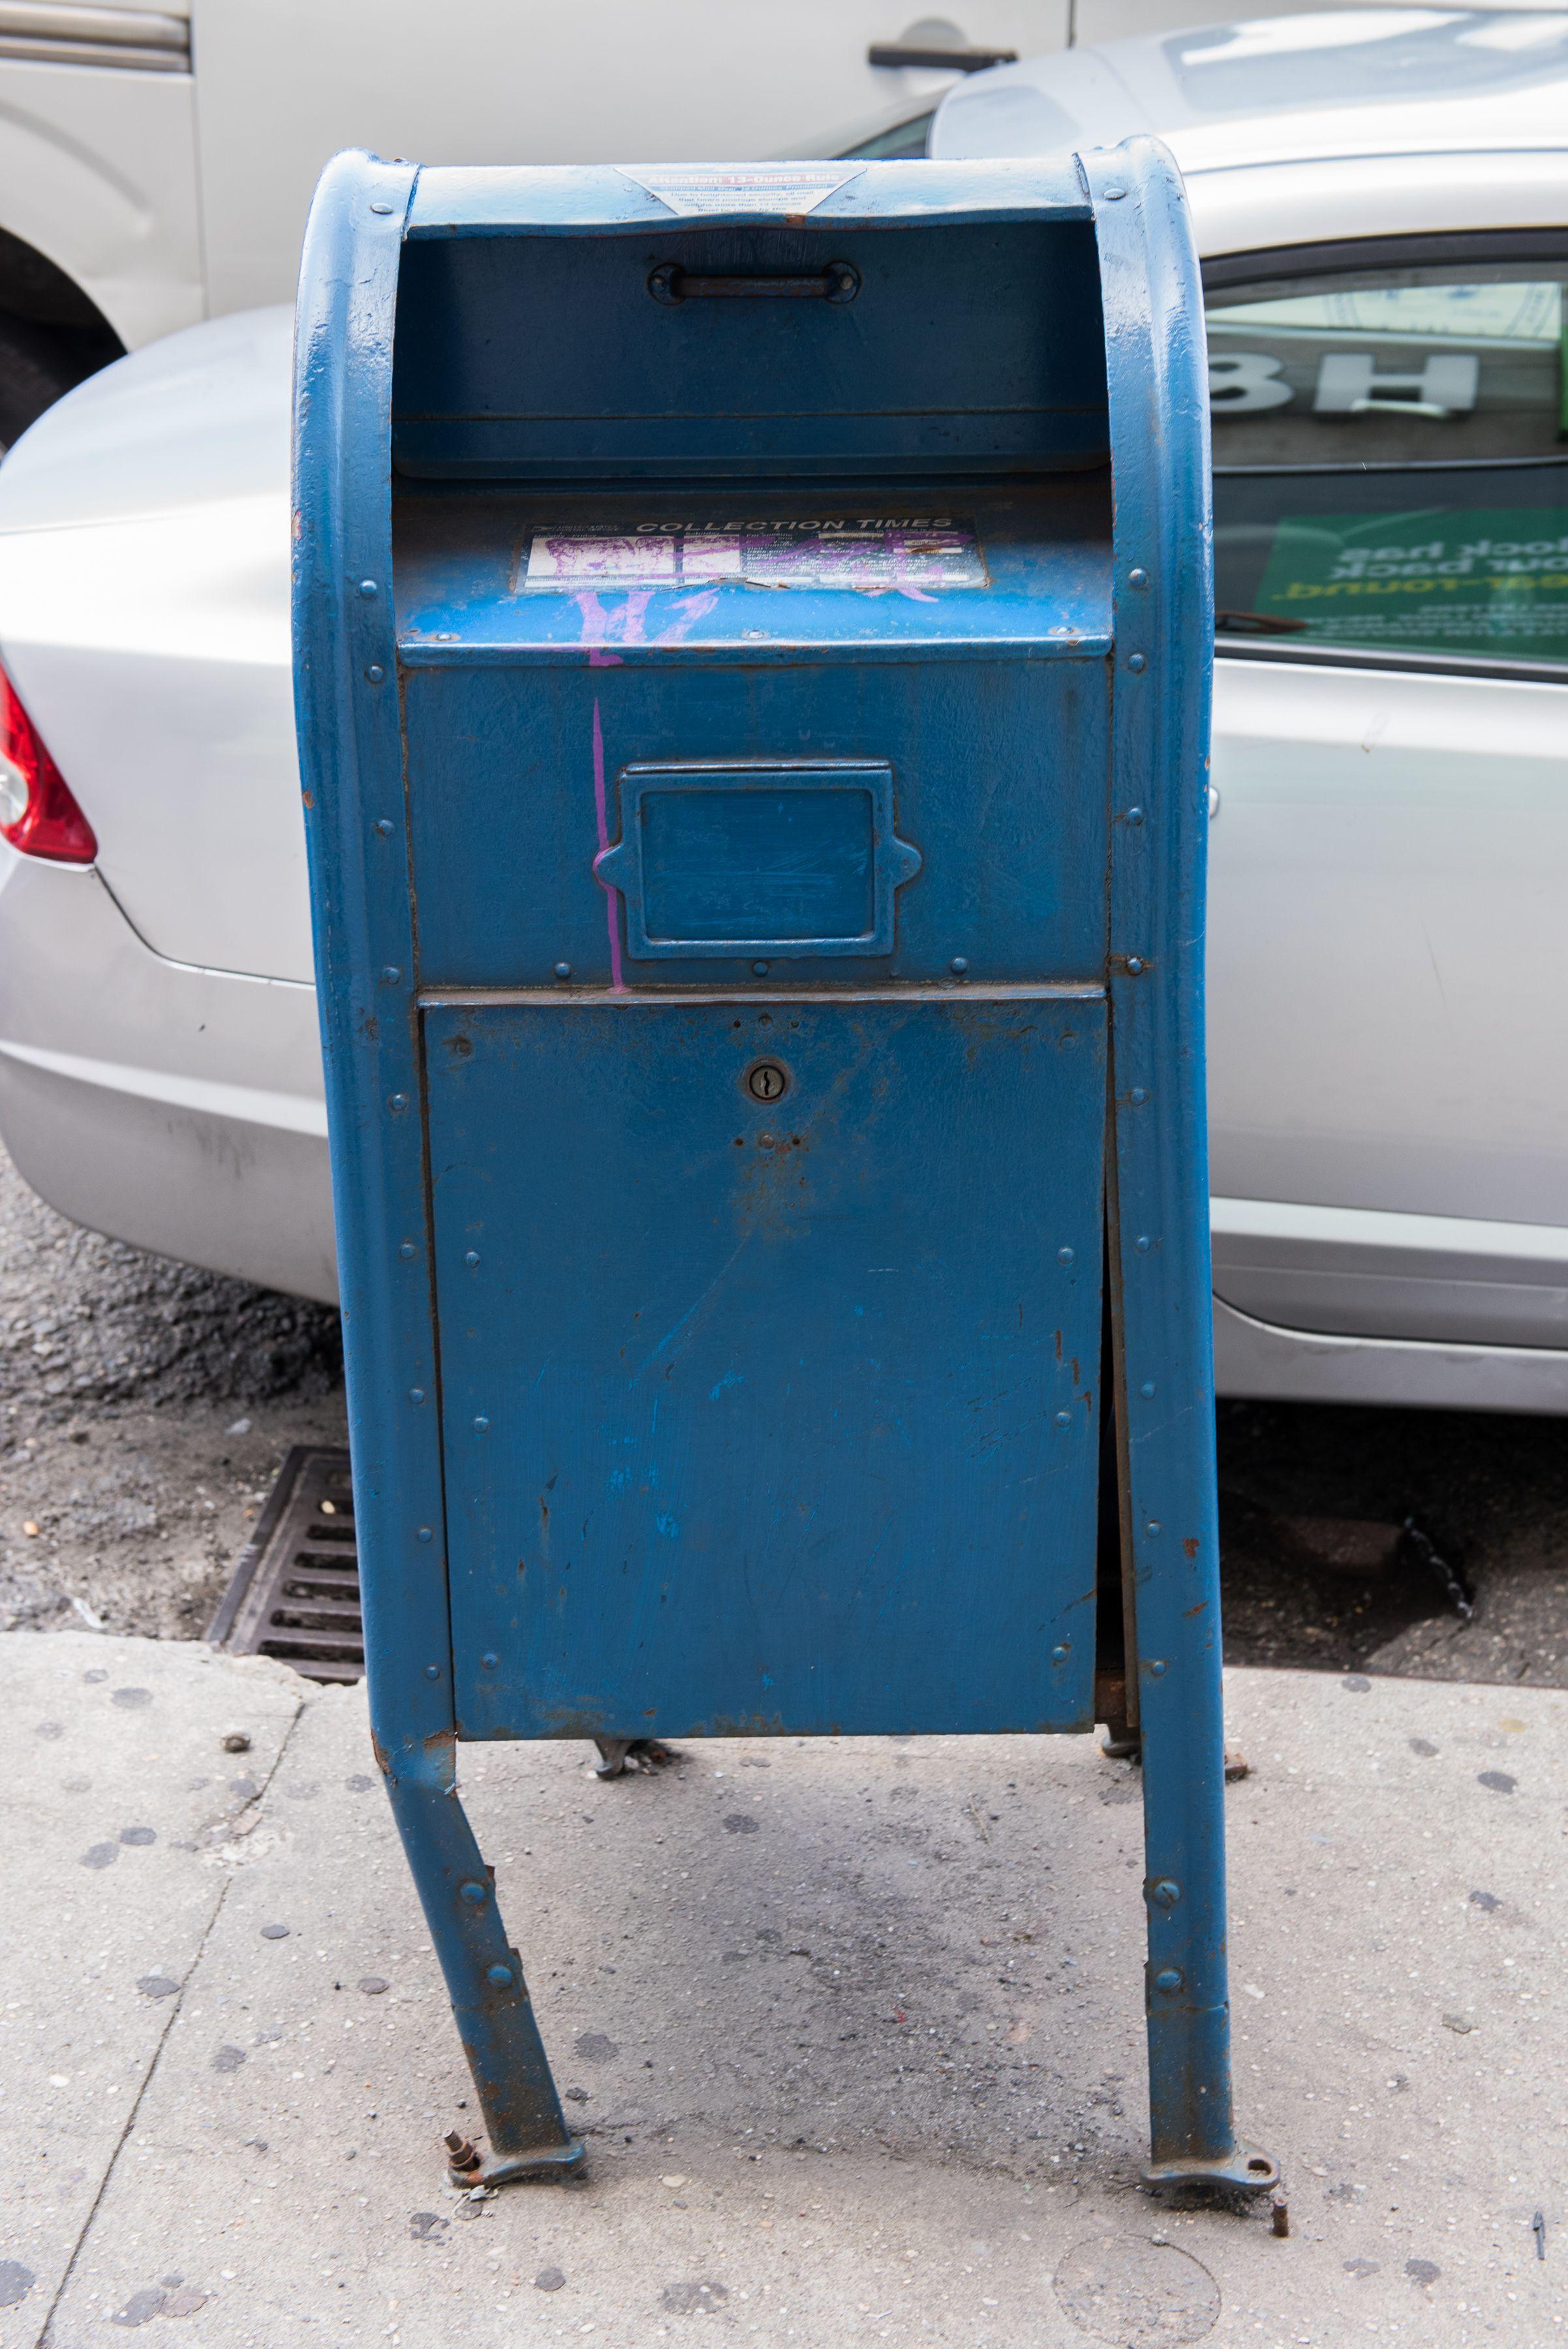 Where's The Nearest Mailbox : where's, nearest, mailbox, Mailbox